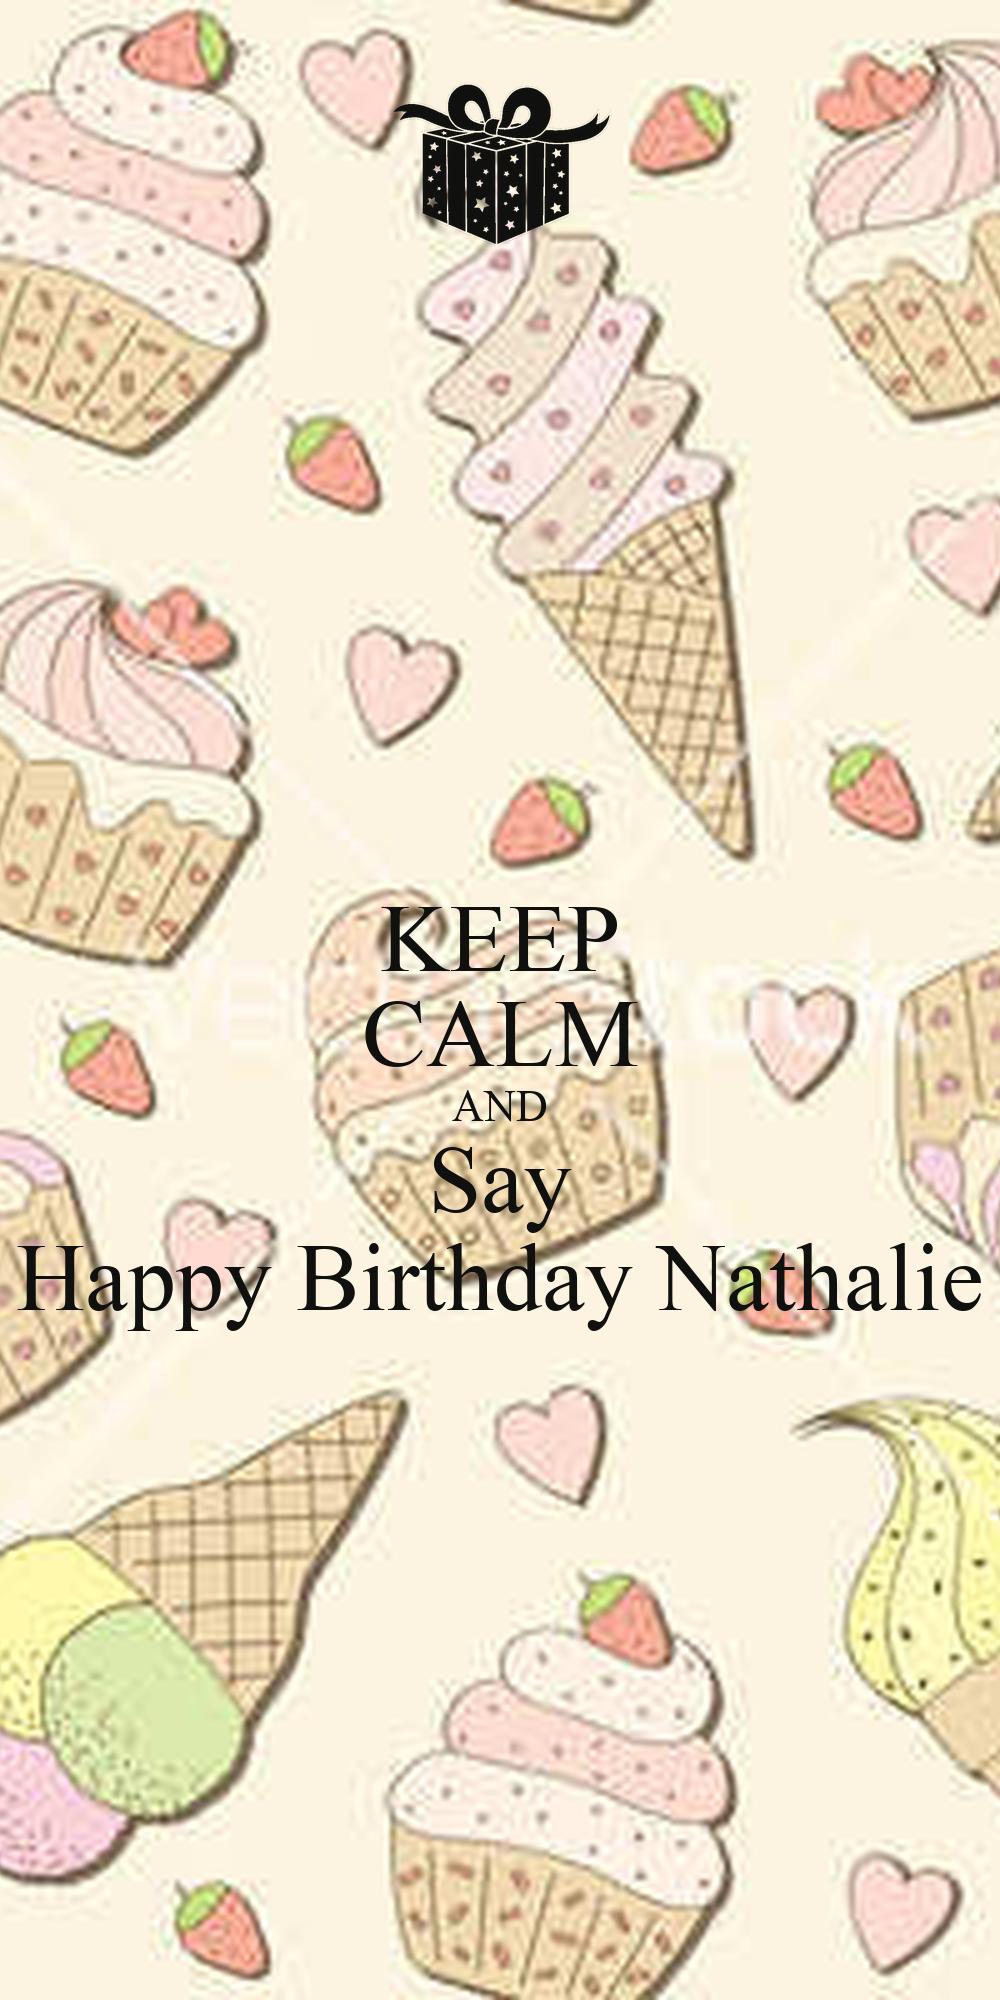 KEEP CALM AND Say Happy Birthday Nathalie Poster